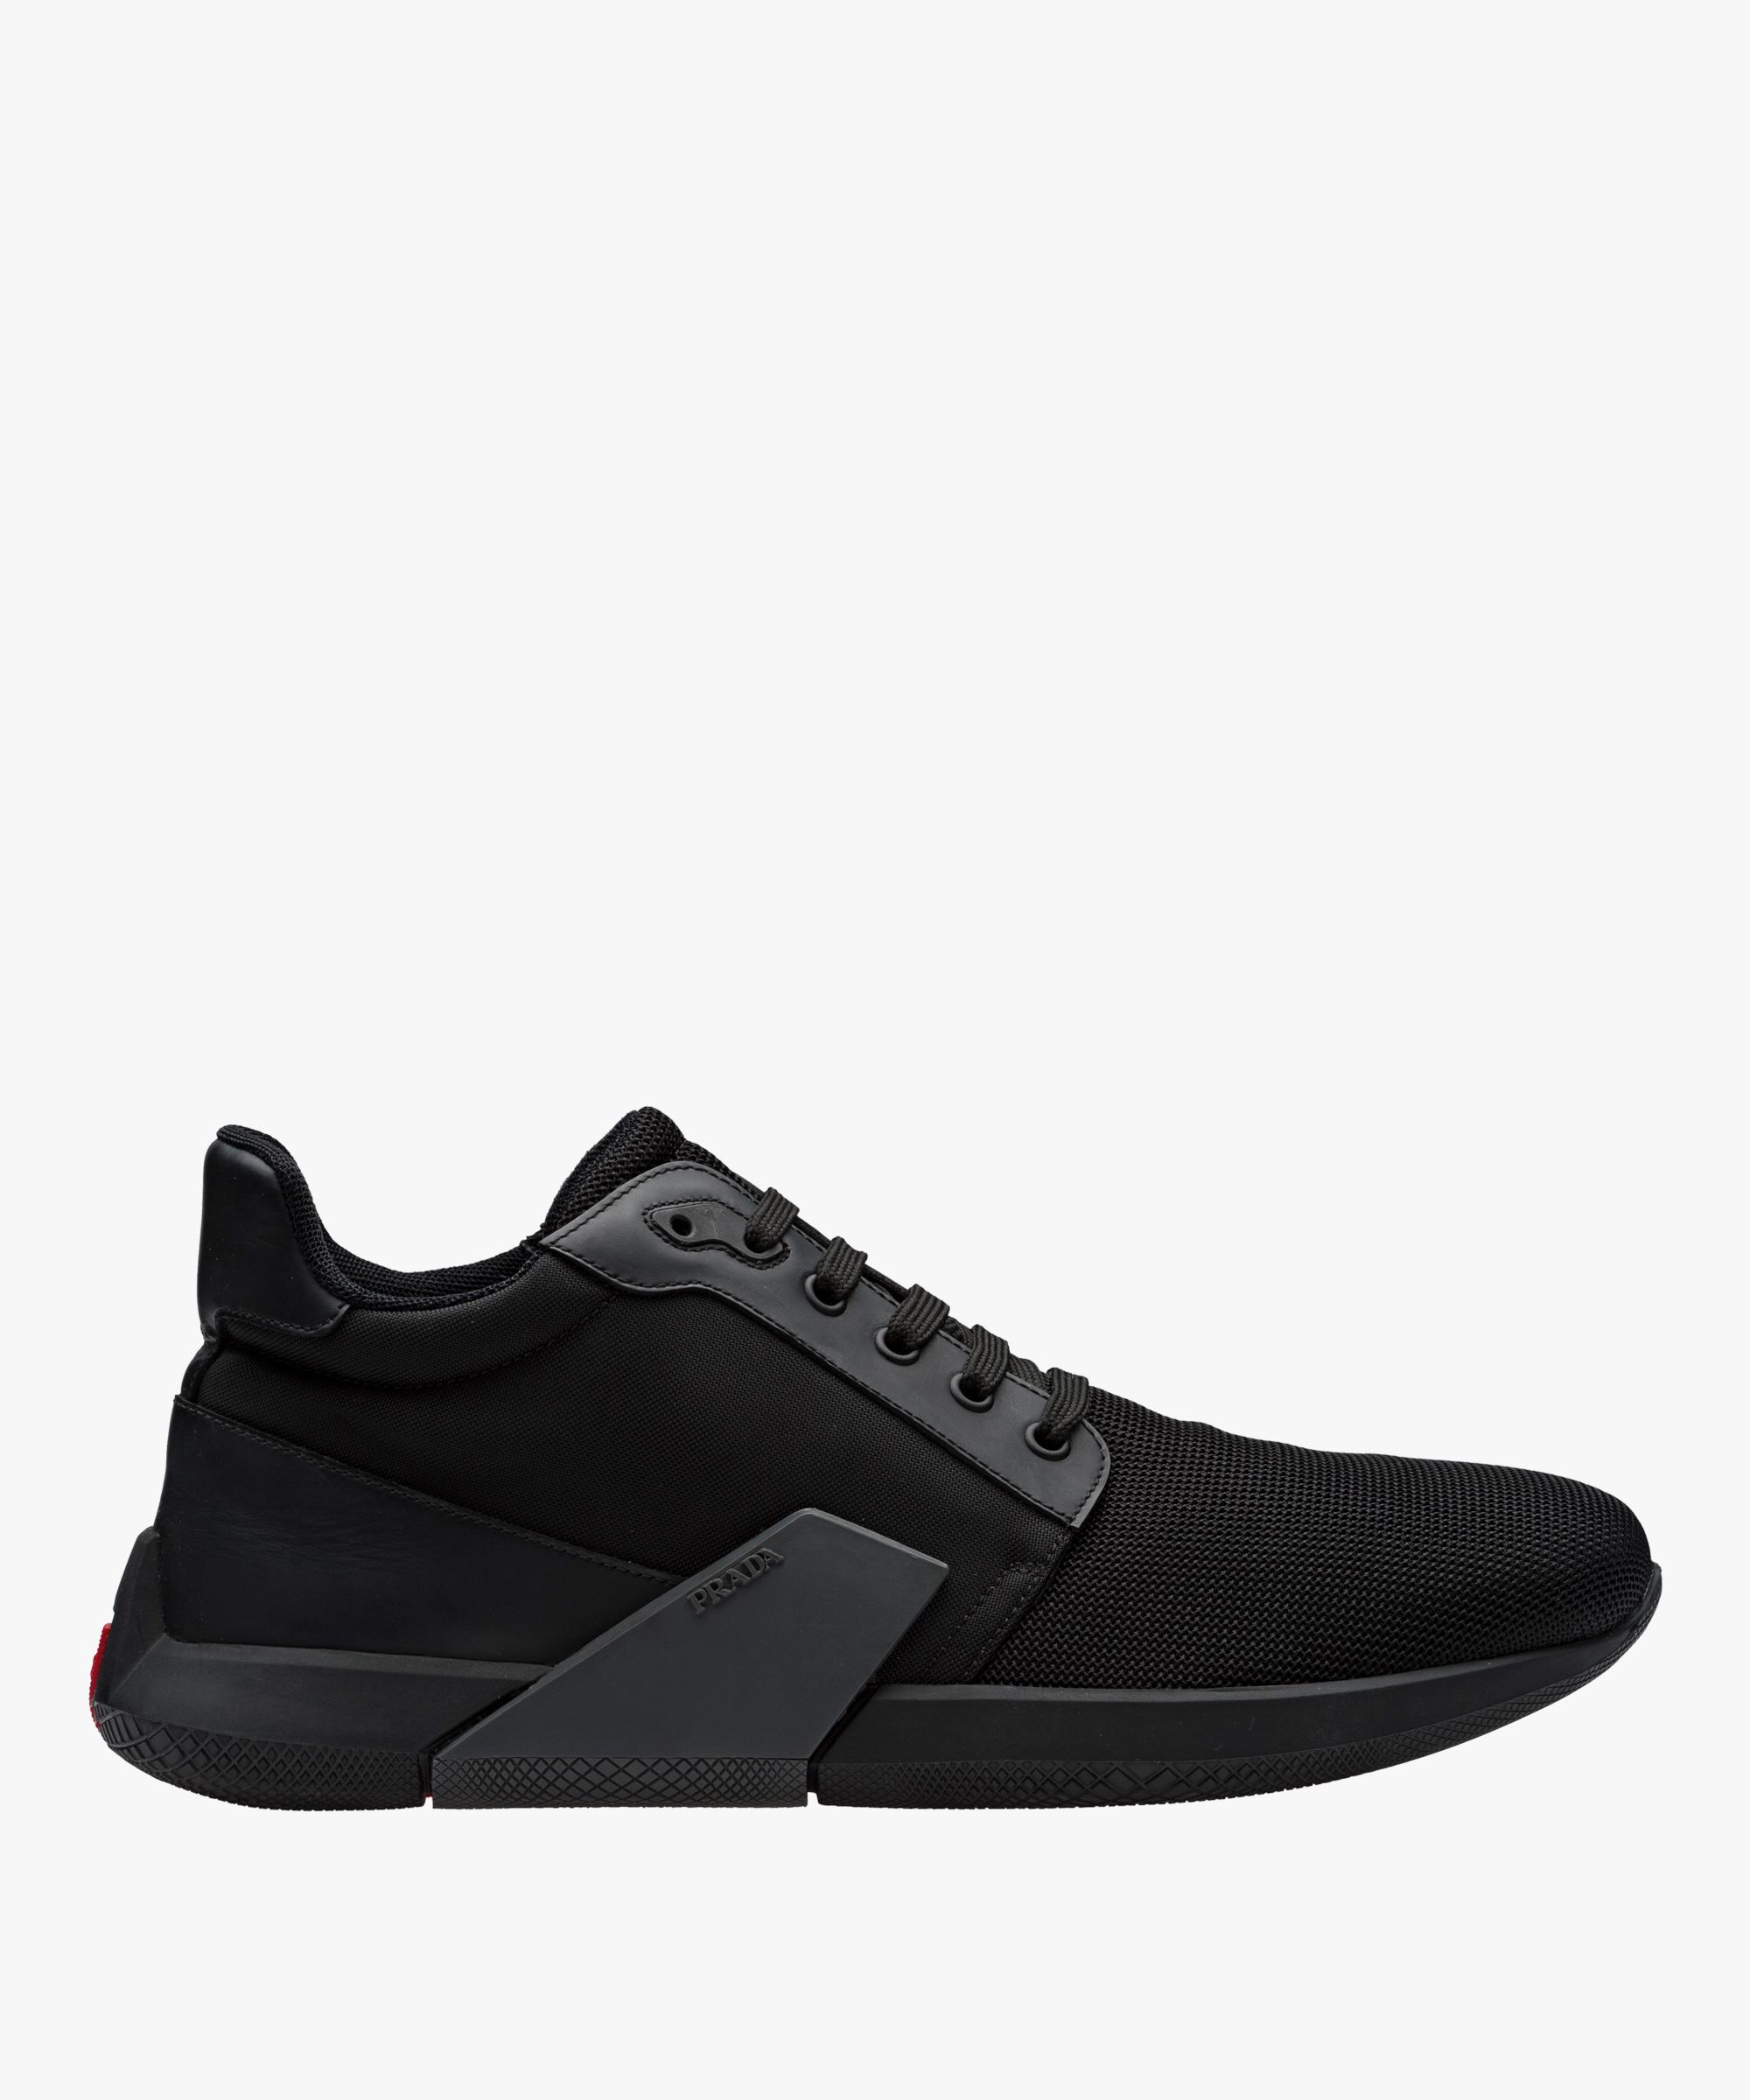 Prada technical fabric sneakers best seller online zESKV2Ju